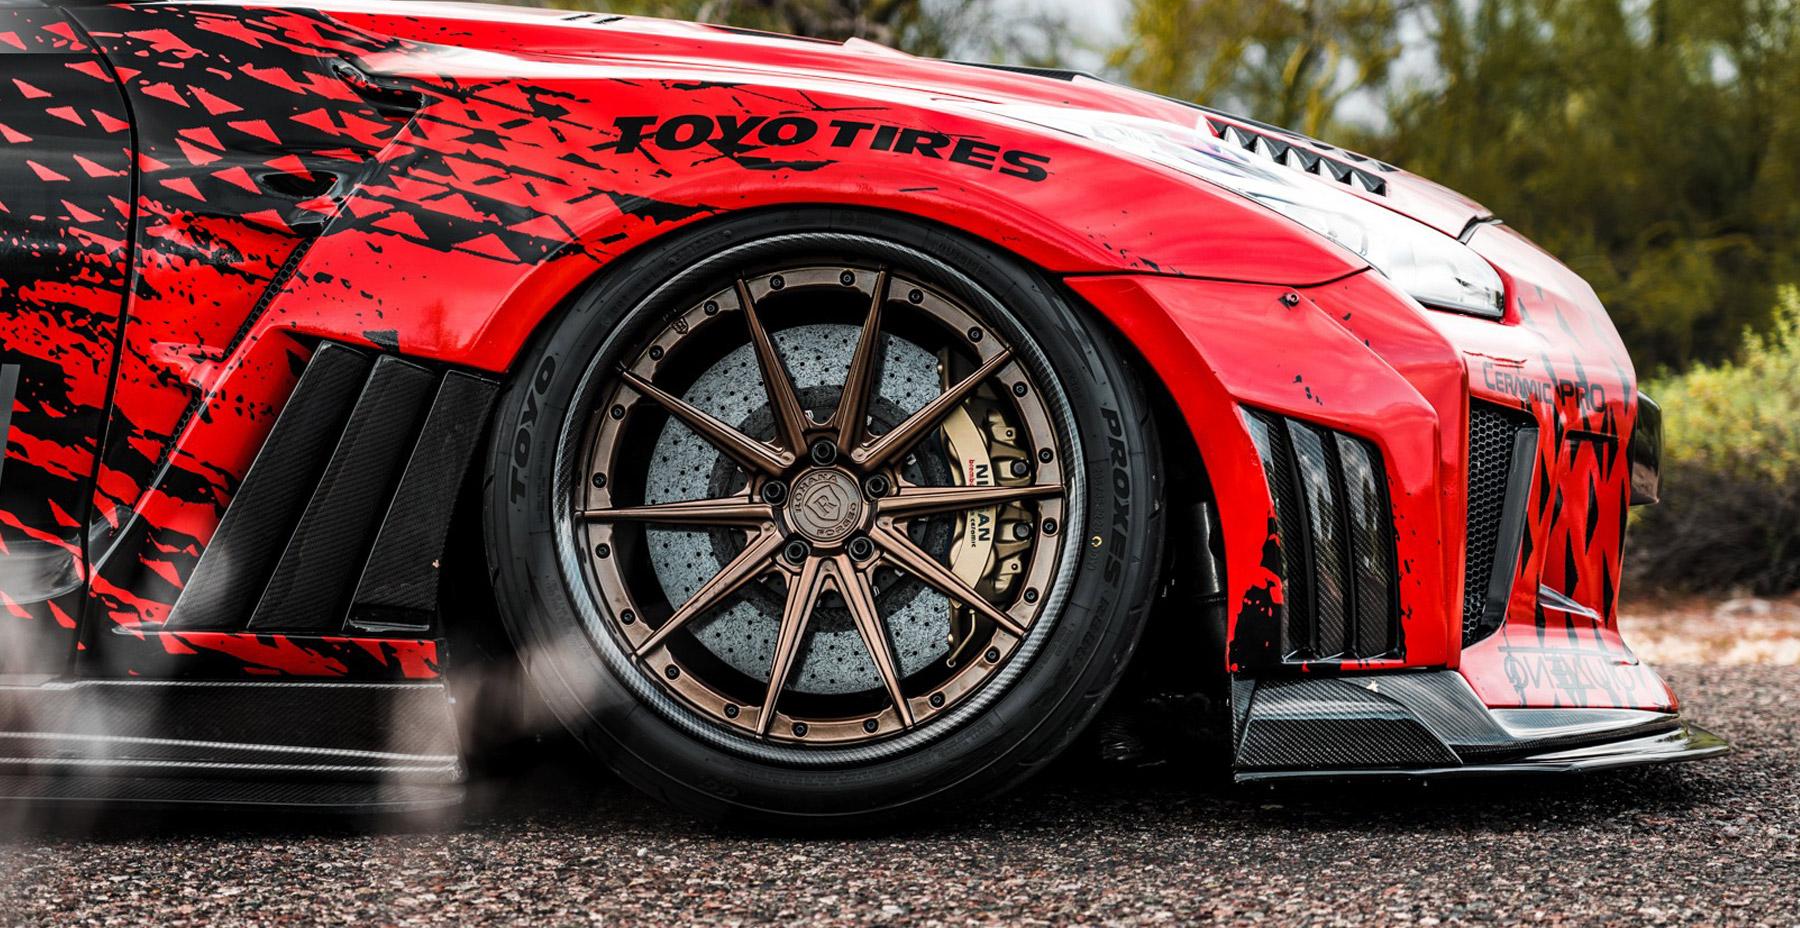 Nissan GTR R35 x Rohana Forged RFG10 (Finished in Matte Bronze | Carbon Fiber Lip)